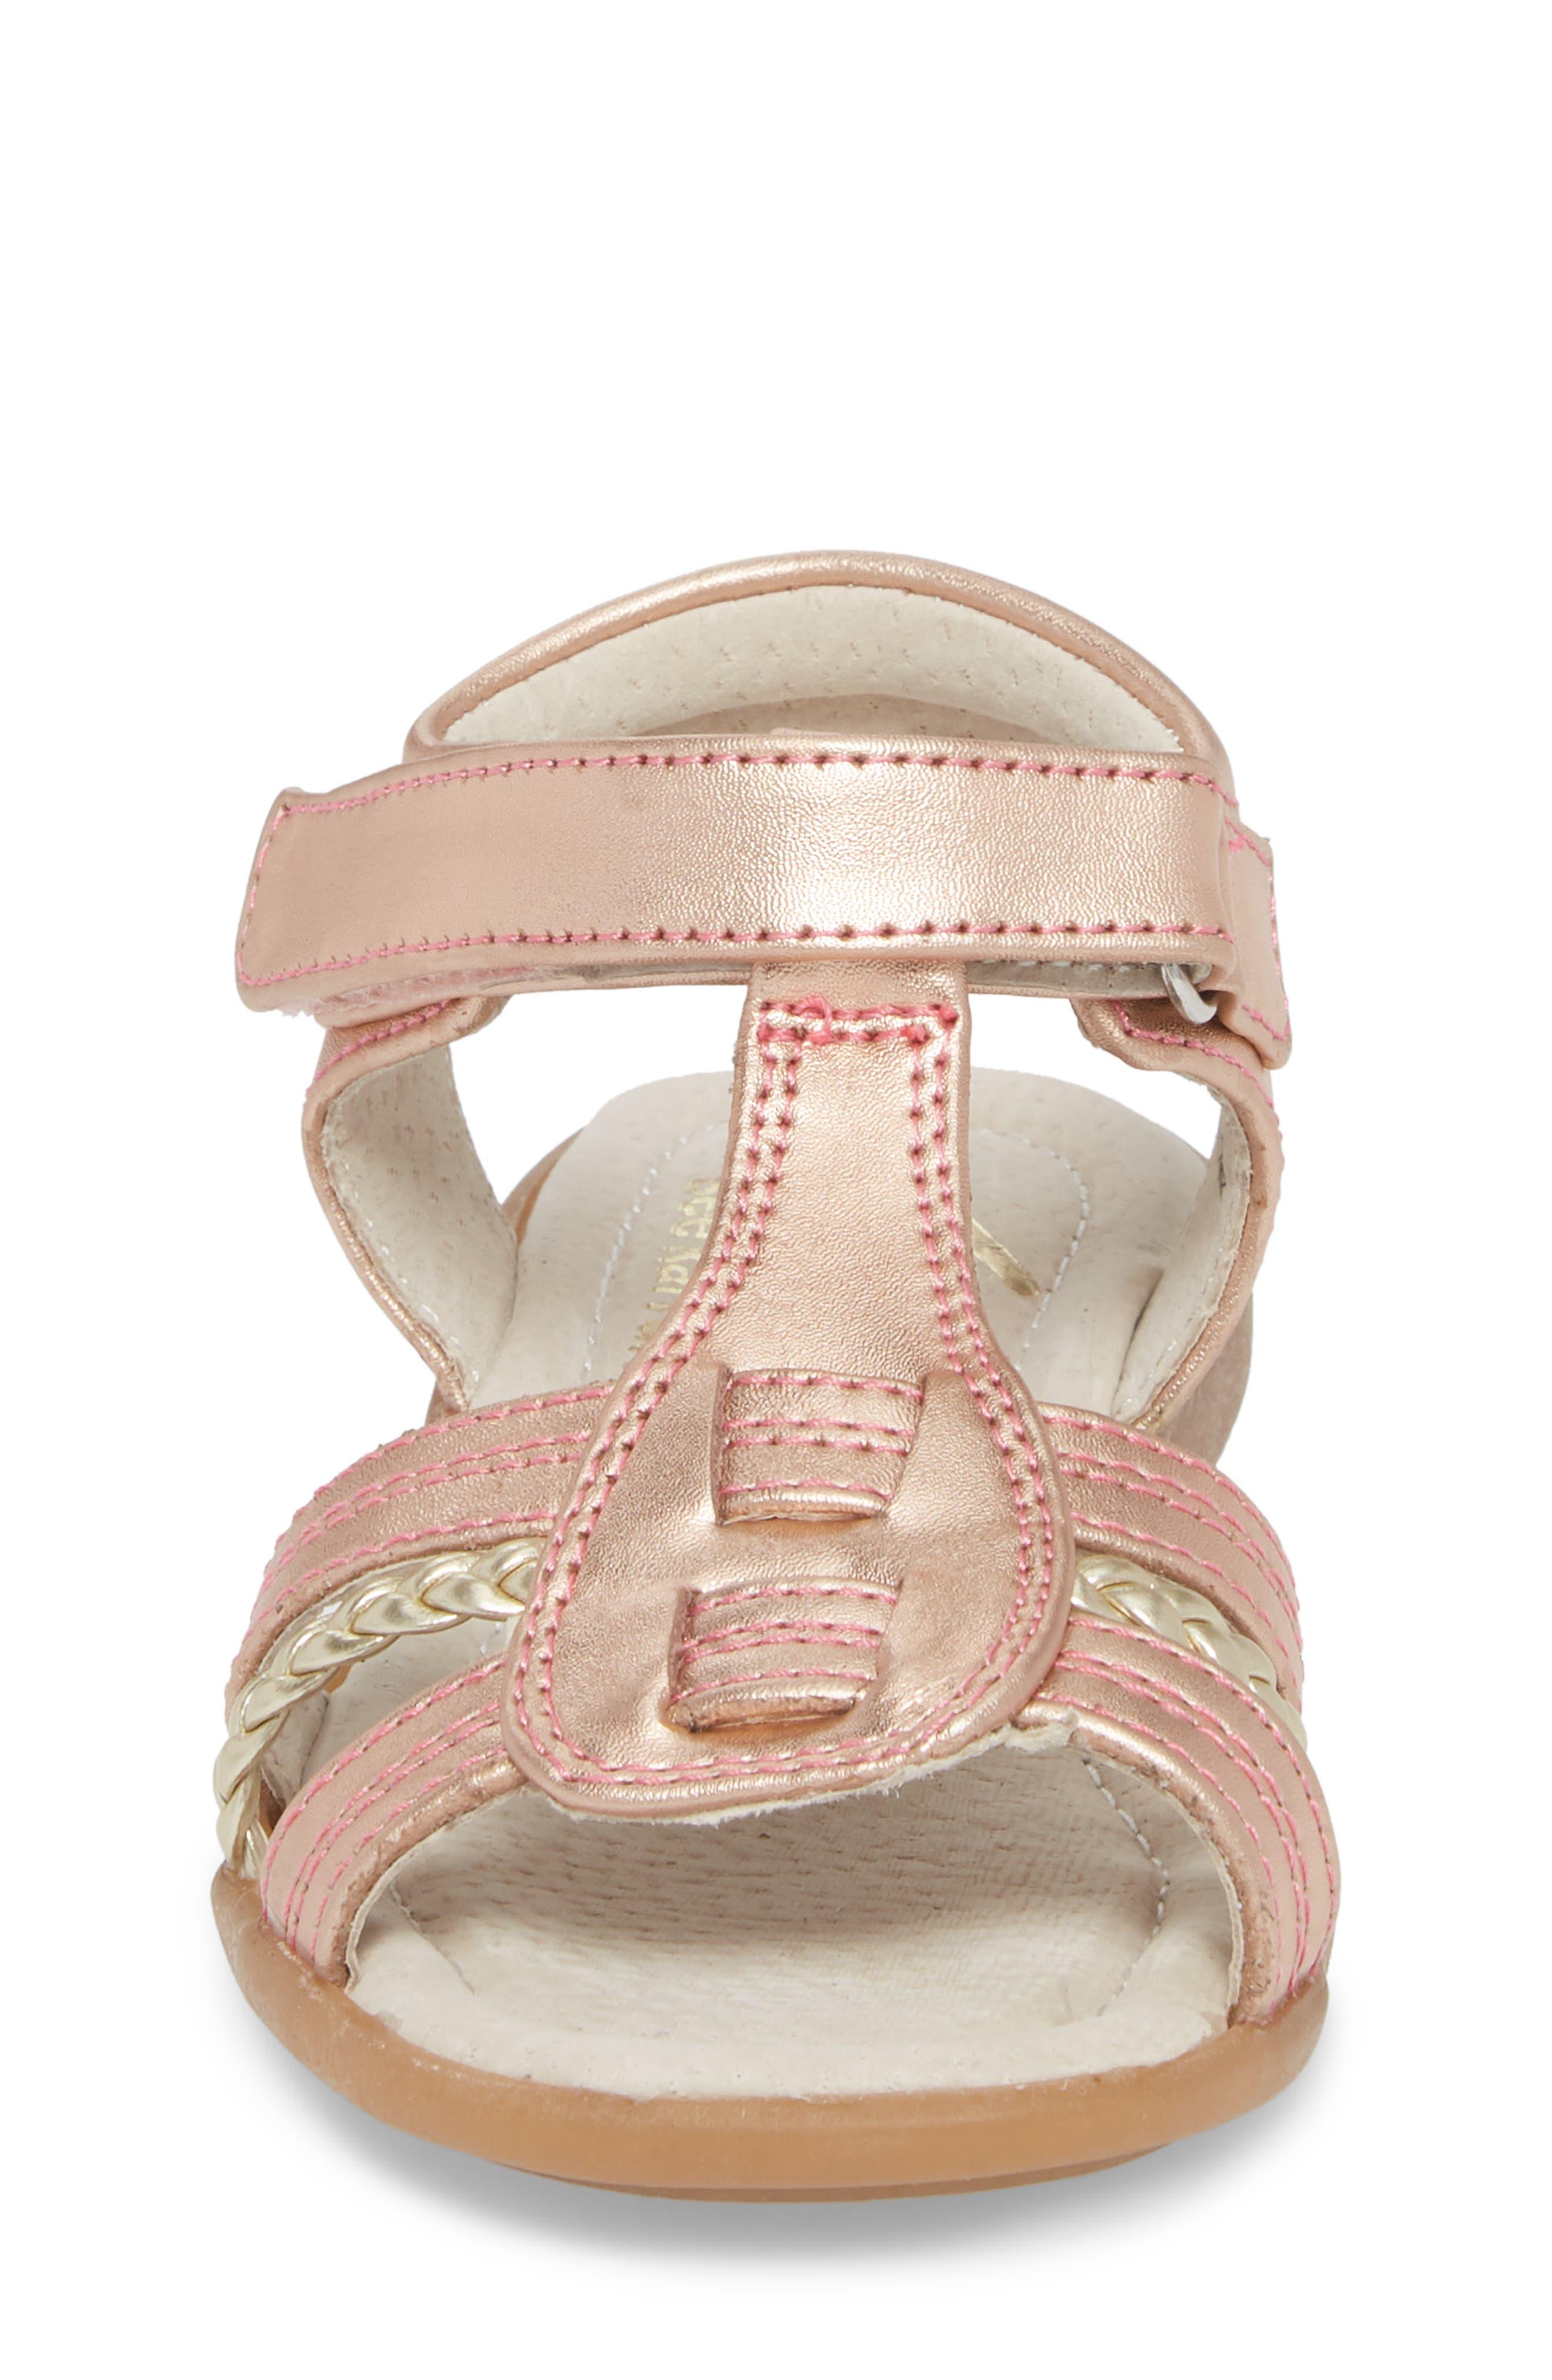 Hadley Metallic Sandal,                             Alternate thumbnail 4, color,                             040